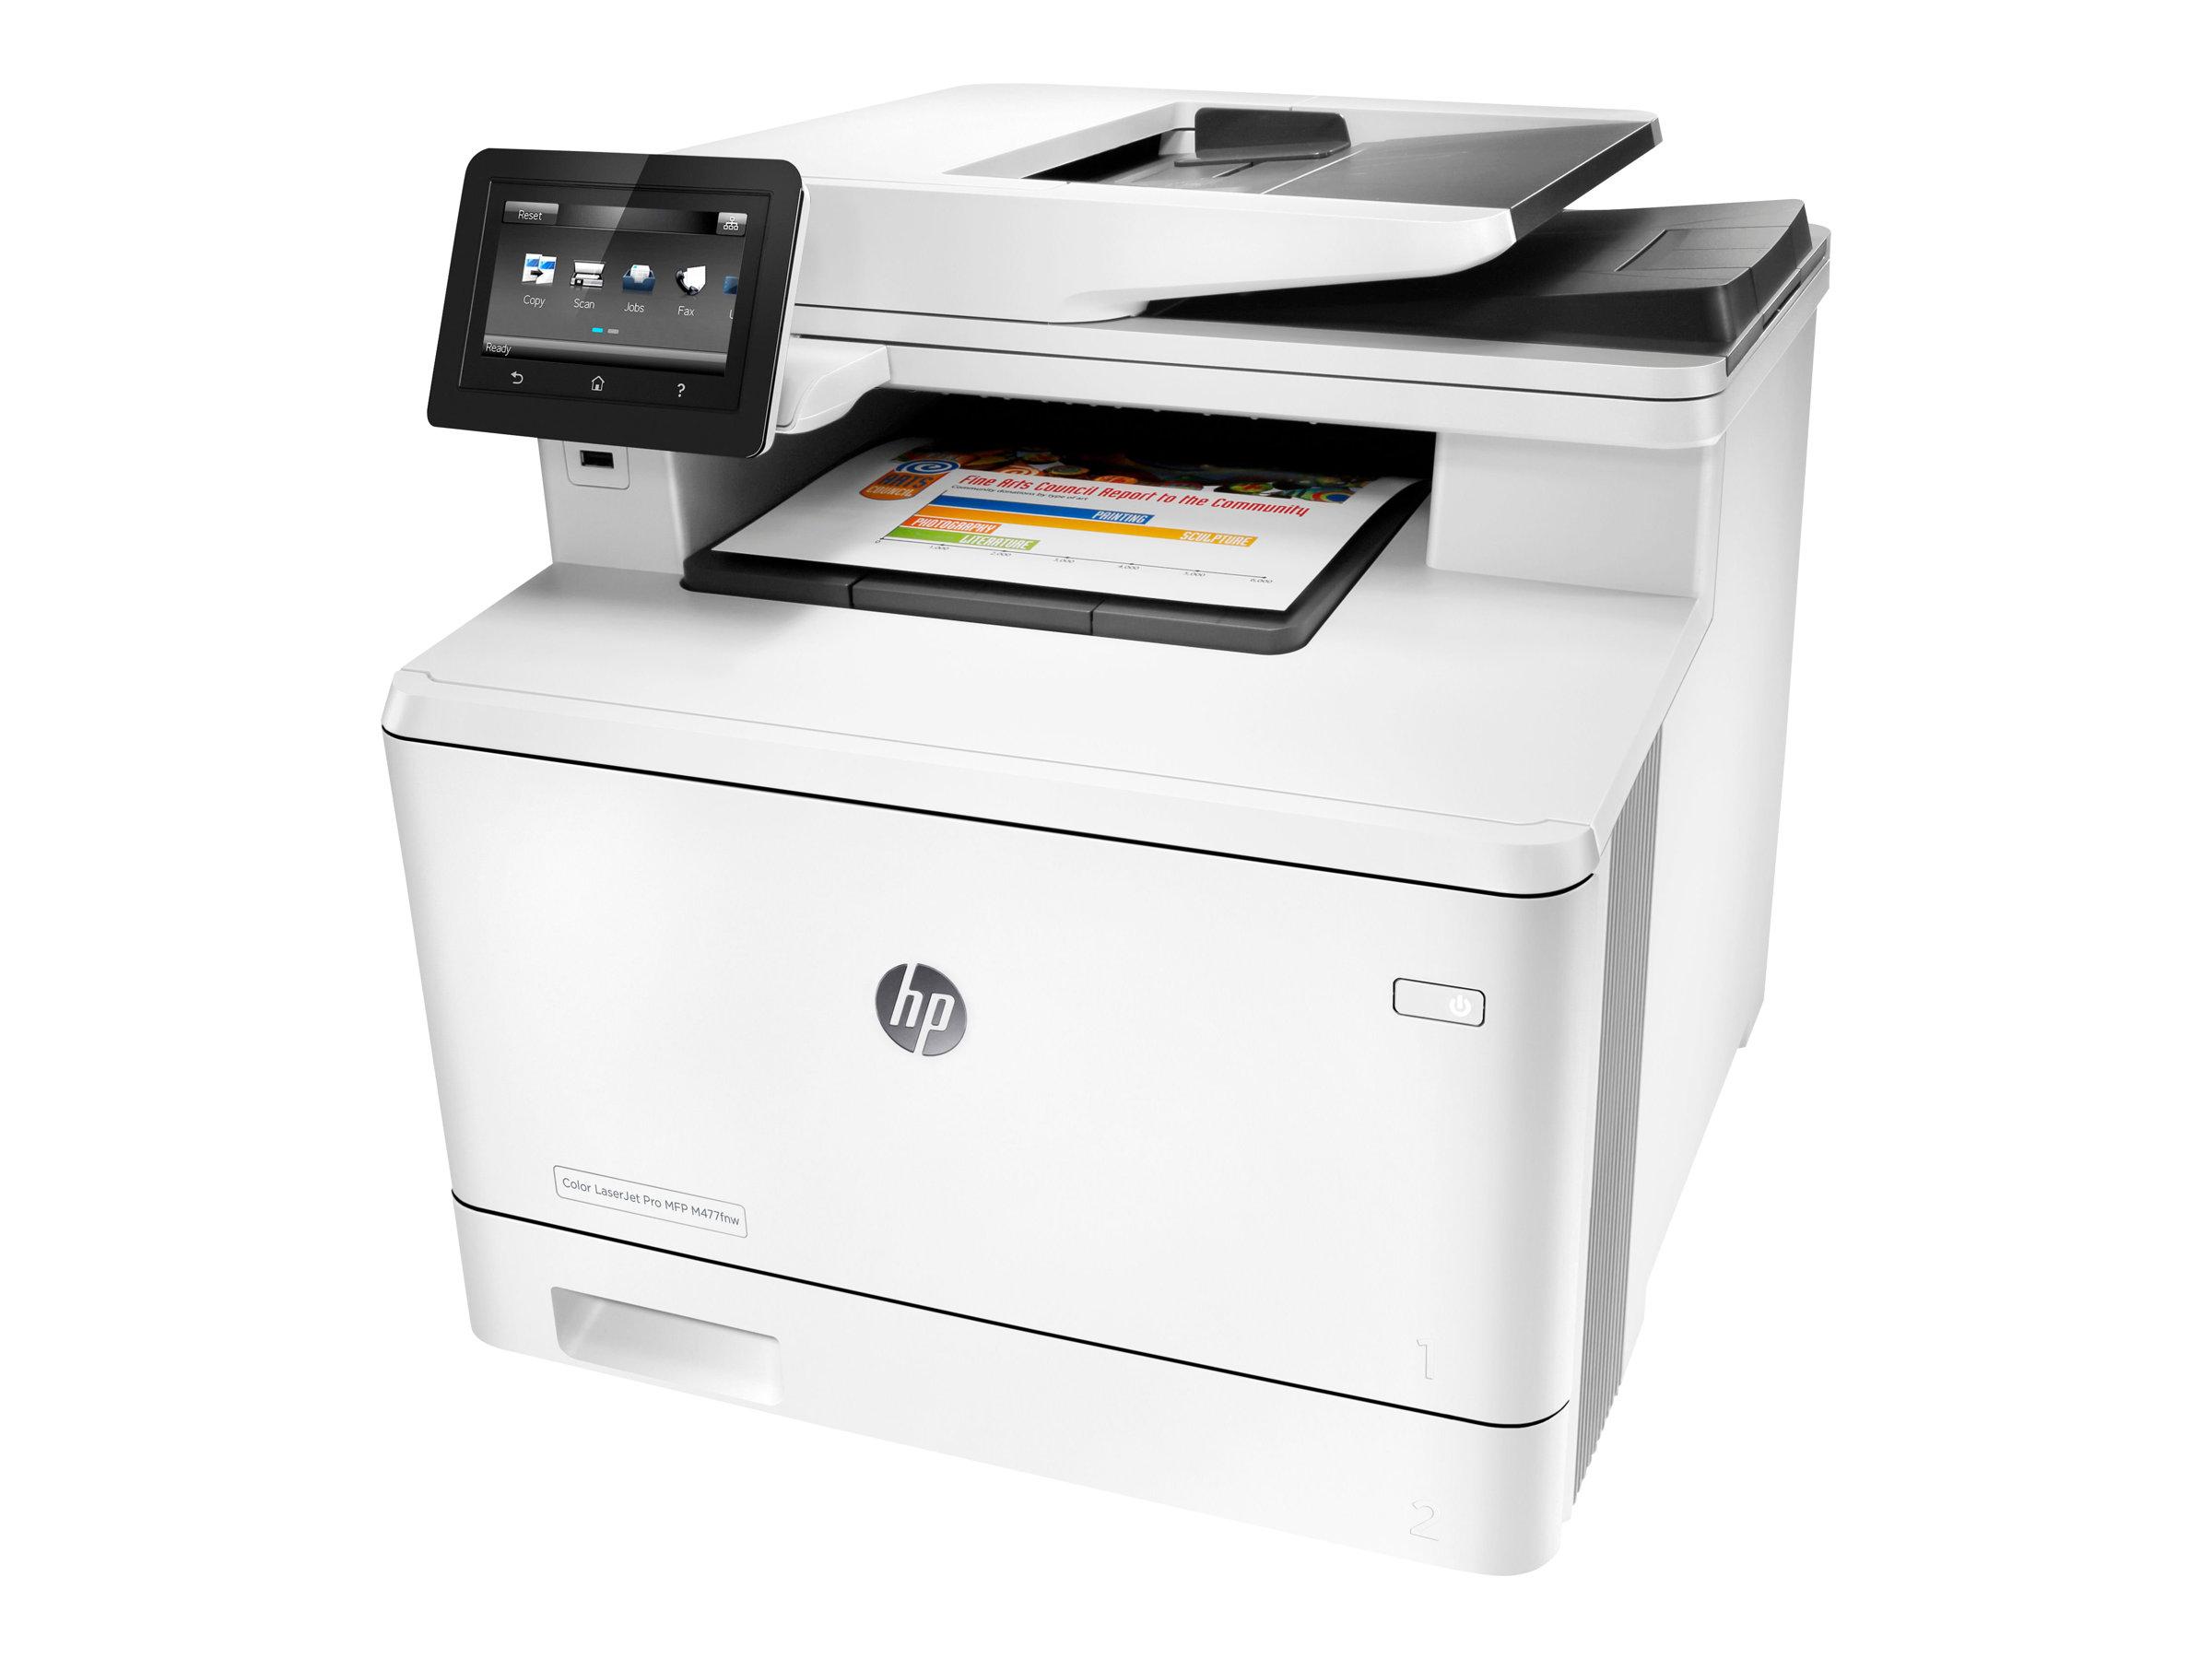 HP Color LaserJet Pro MFP M477fnw - Multifunktionsdrucker - Farbe - Laser - Legal (216 x 356 mm) (Original) - A4/Legal (Medien)